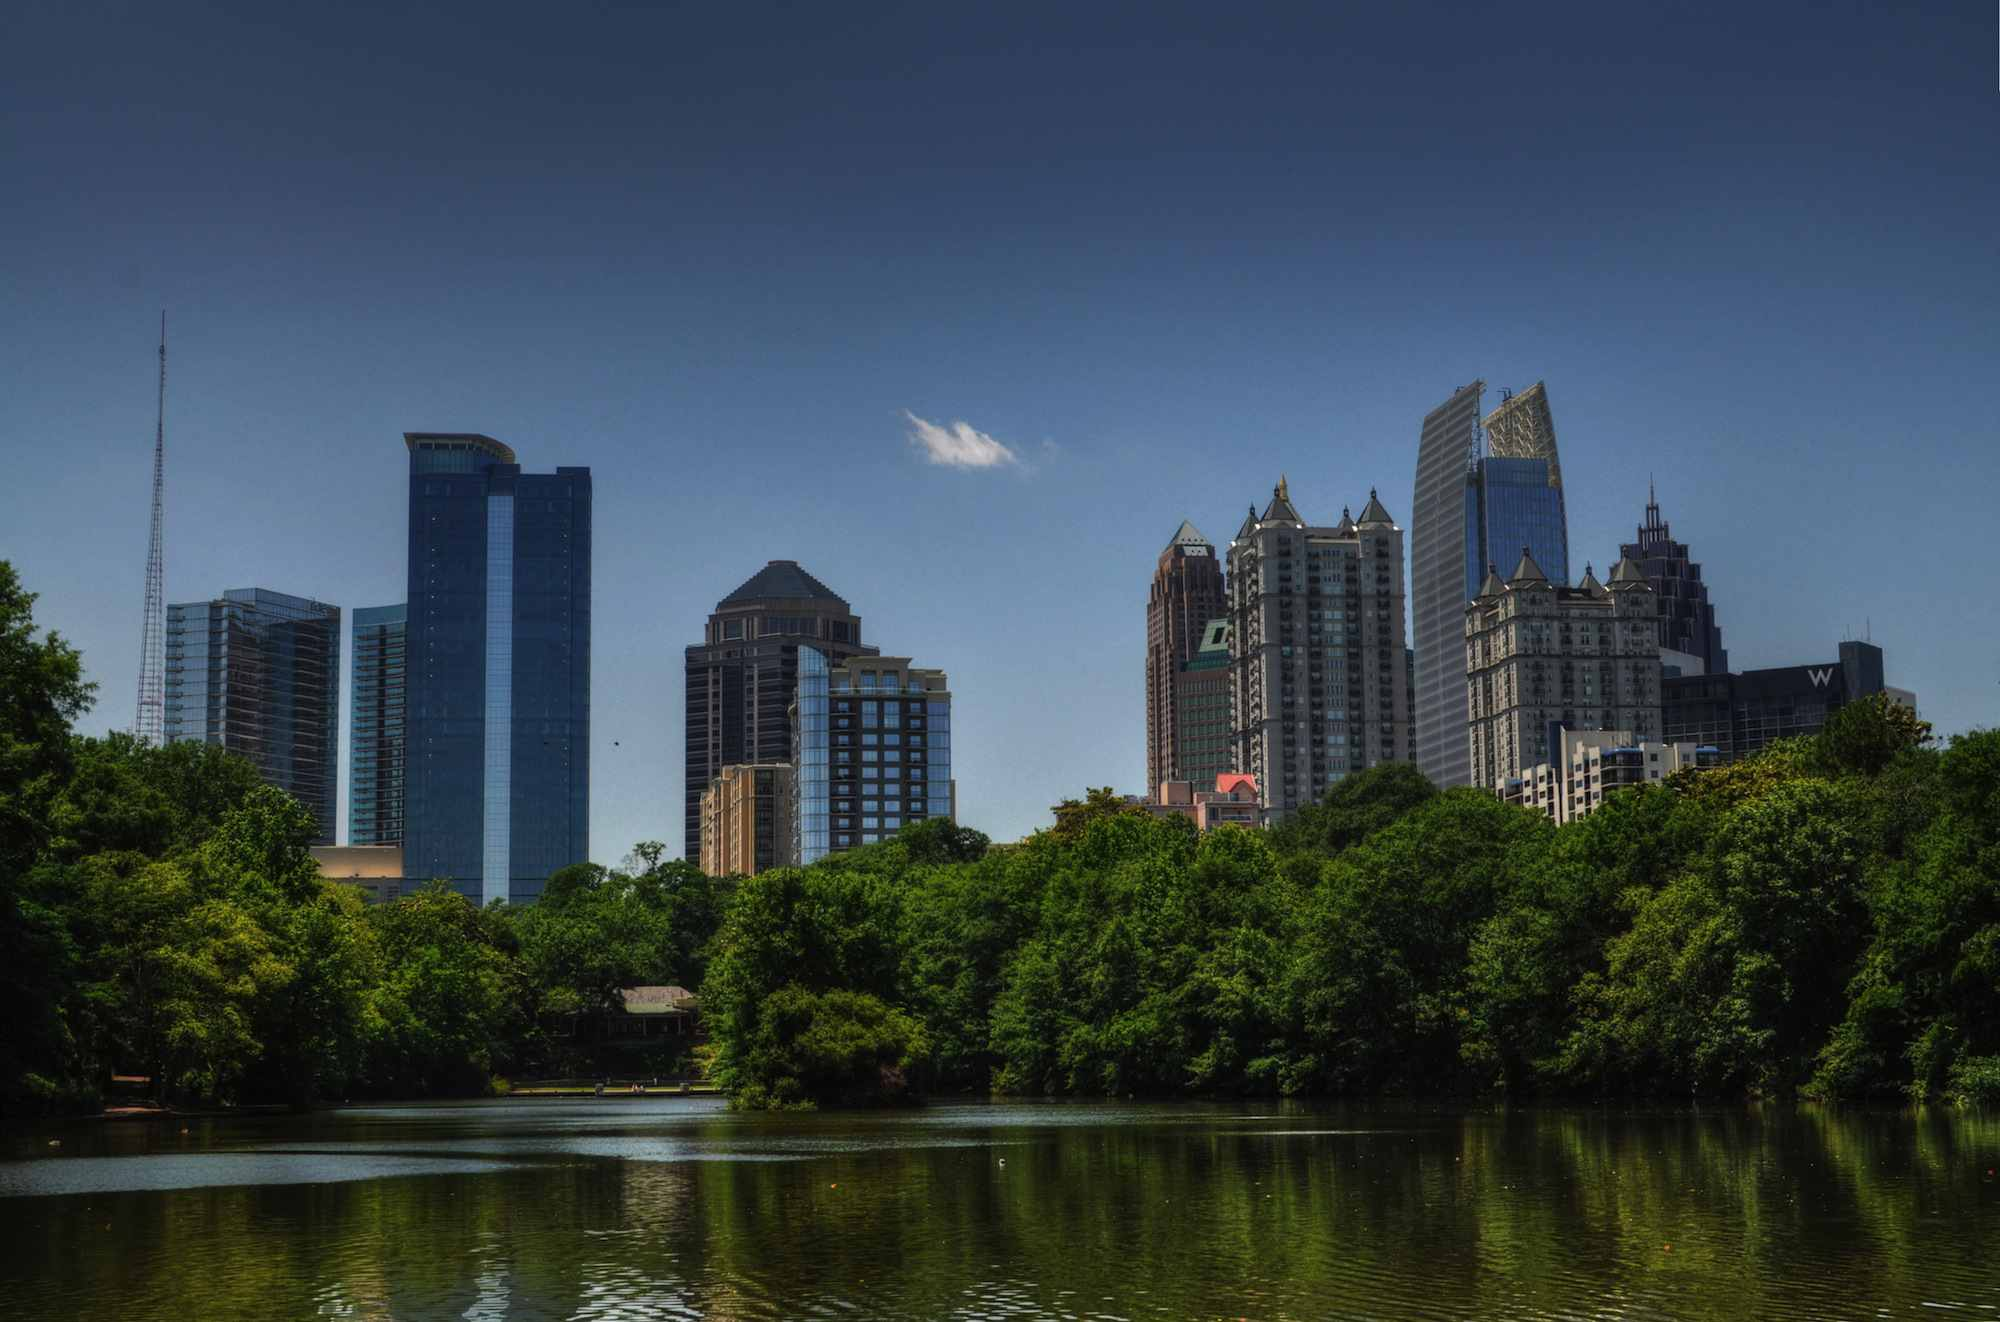 The skyline of Midtown Atlanta over Piedmont Park